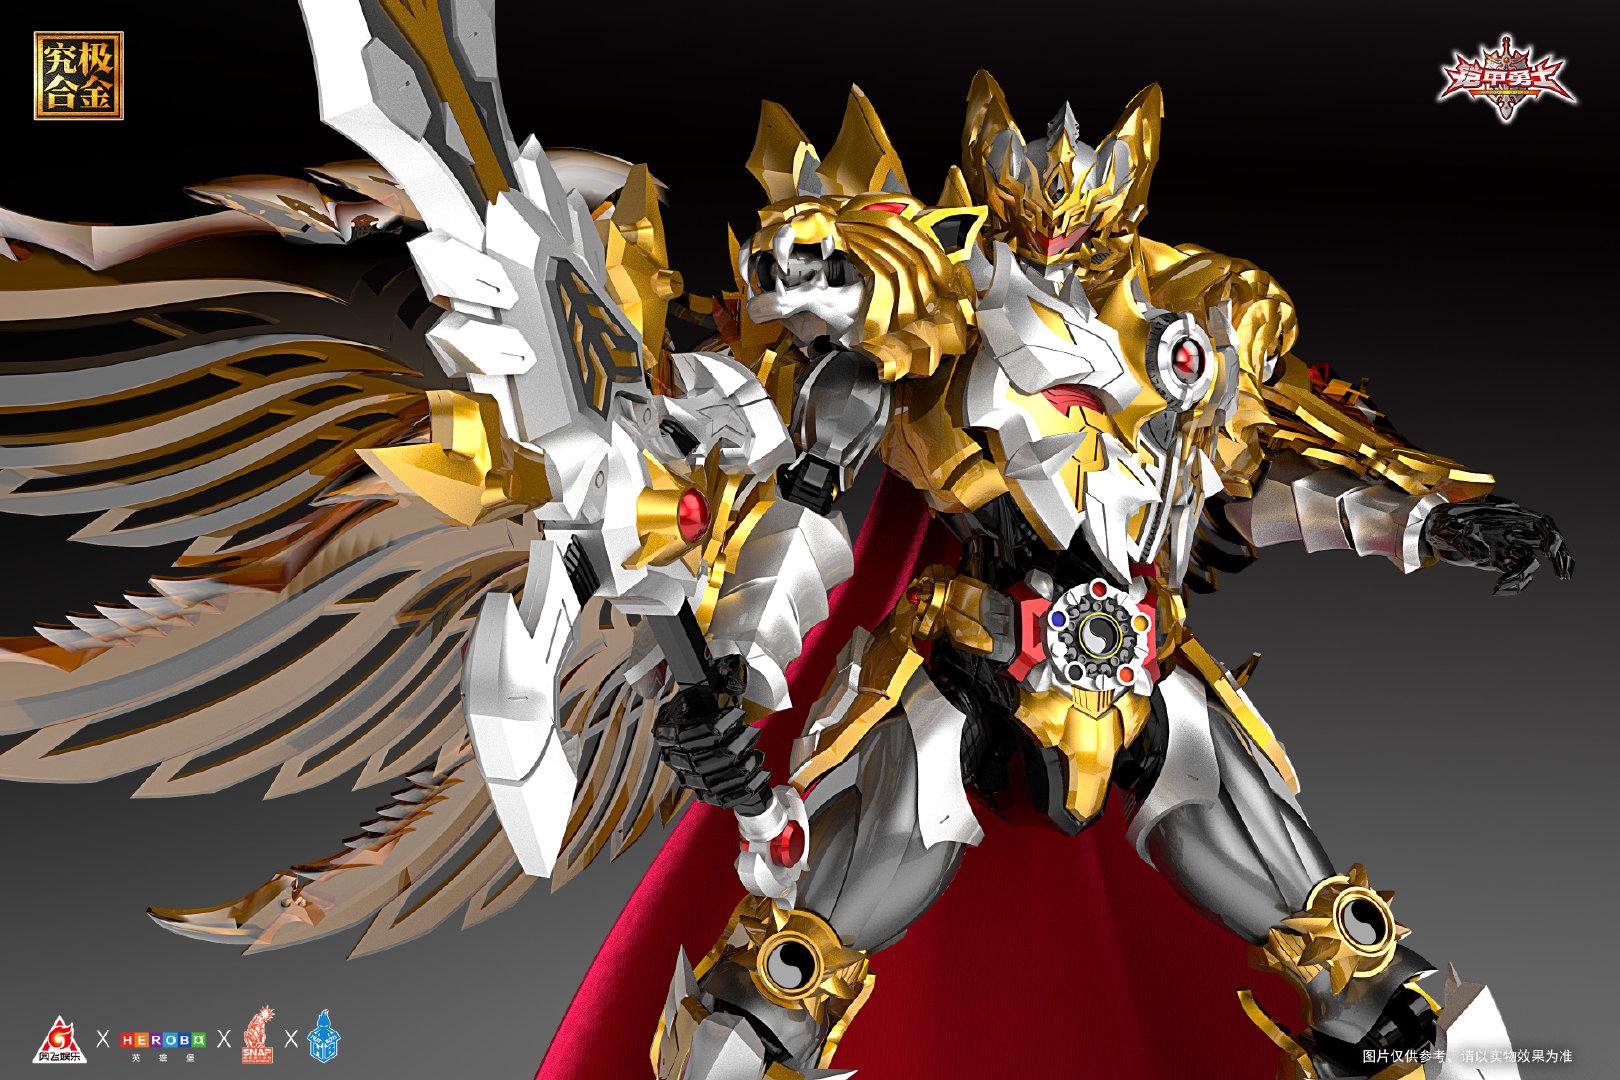 S535_Armor_hero_Emperor_035.jpg